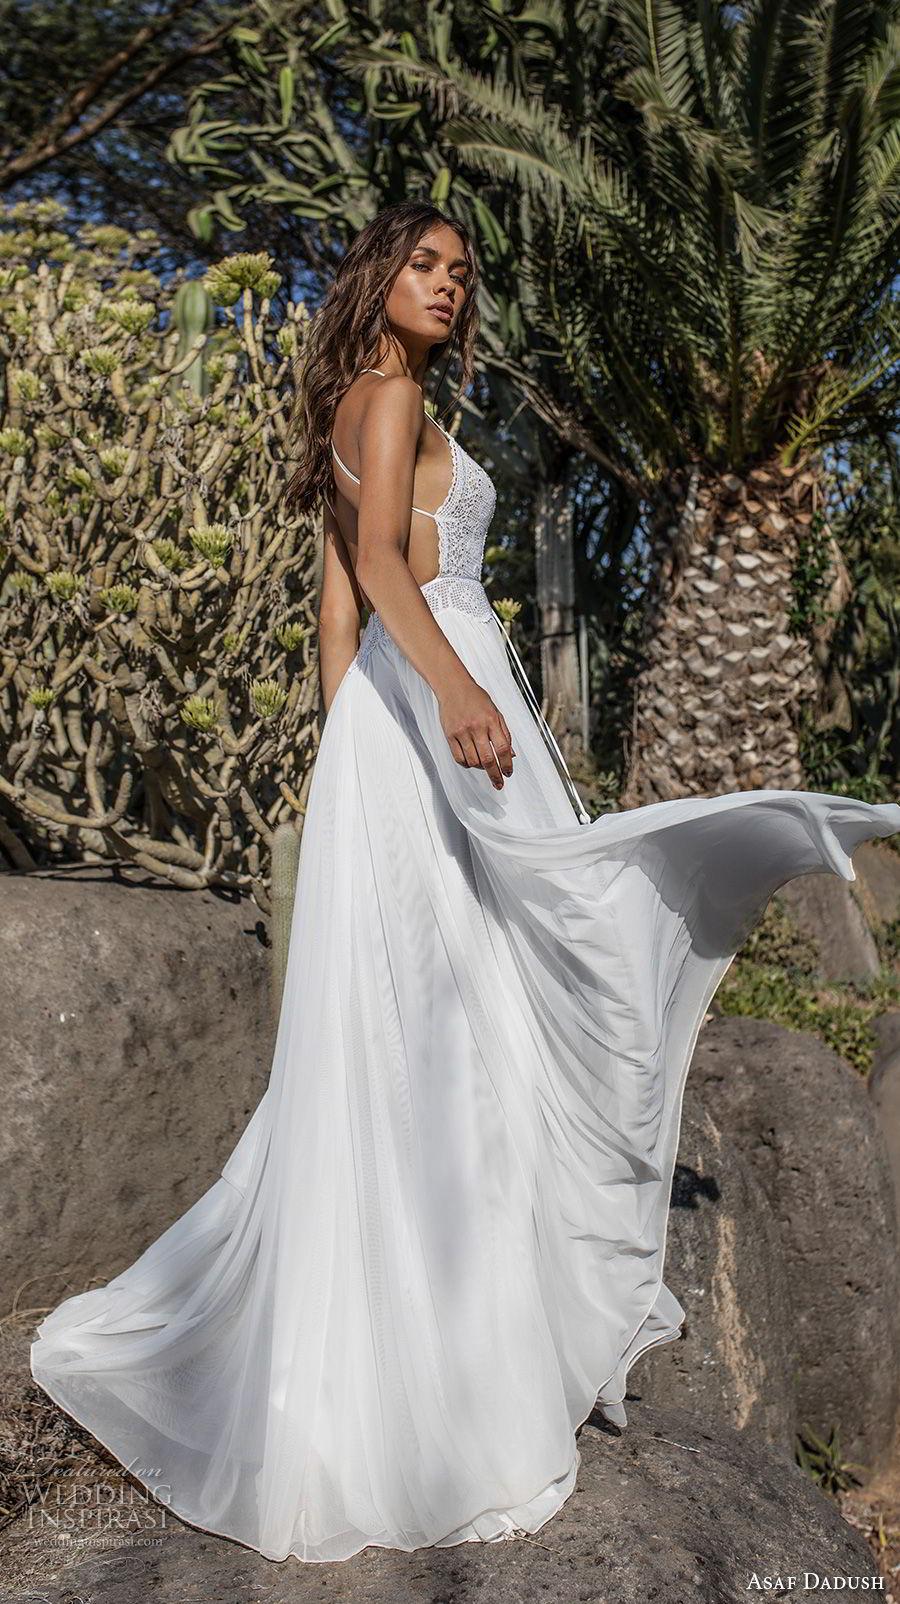 Asaf Dadush 2018 Wedding Dresses  Wedding Inspirasi